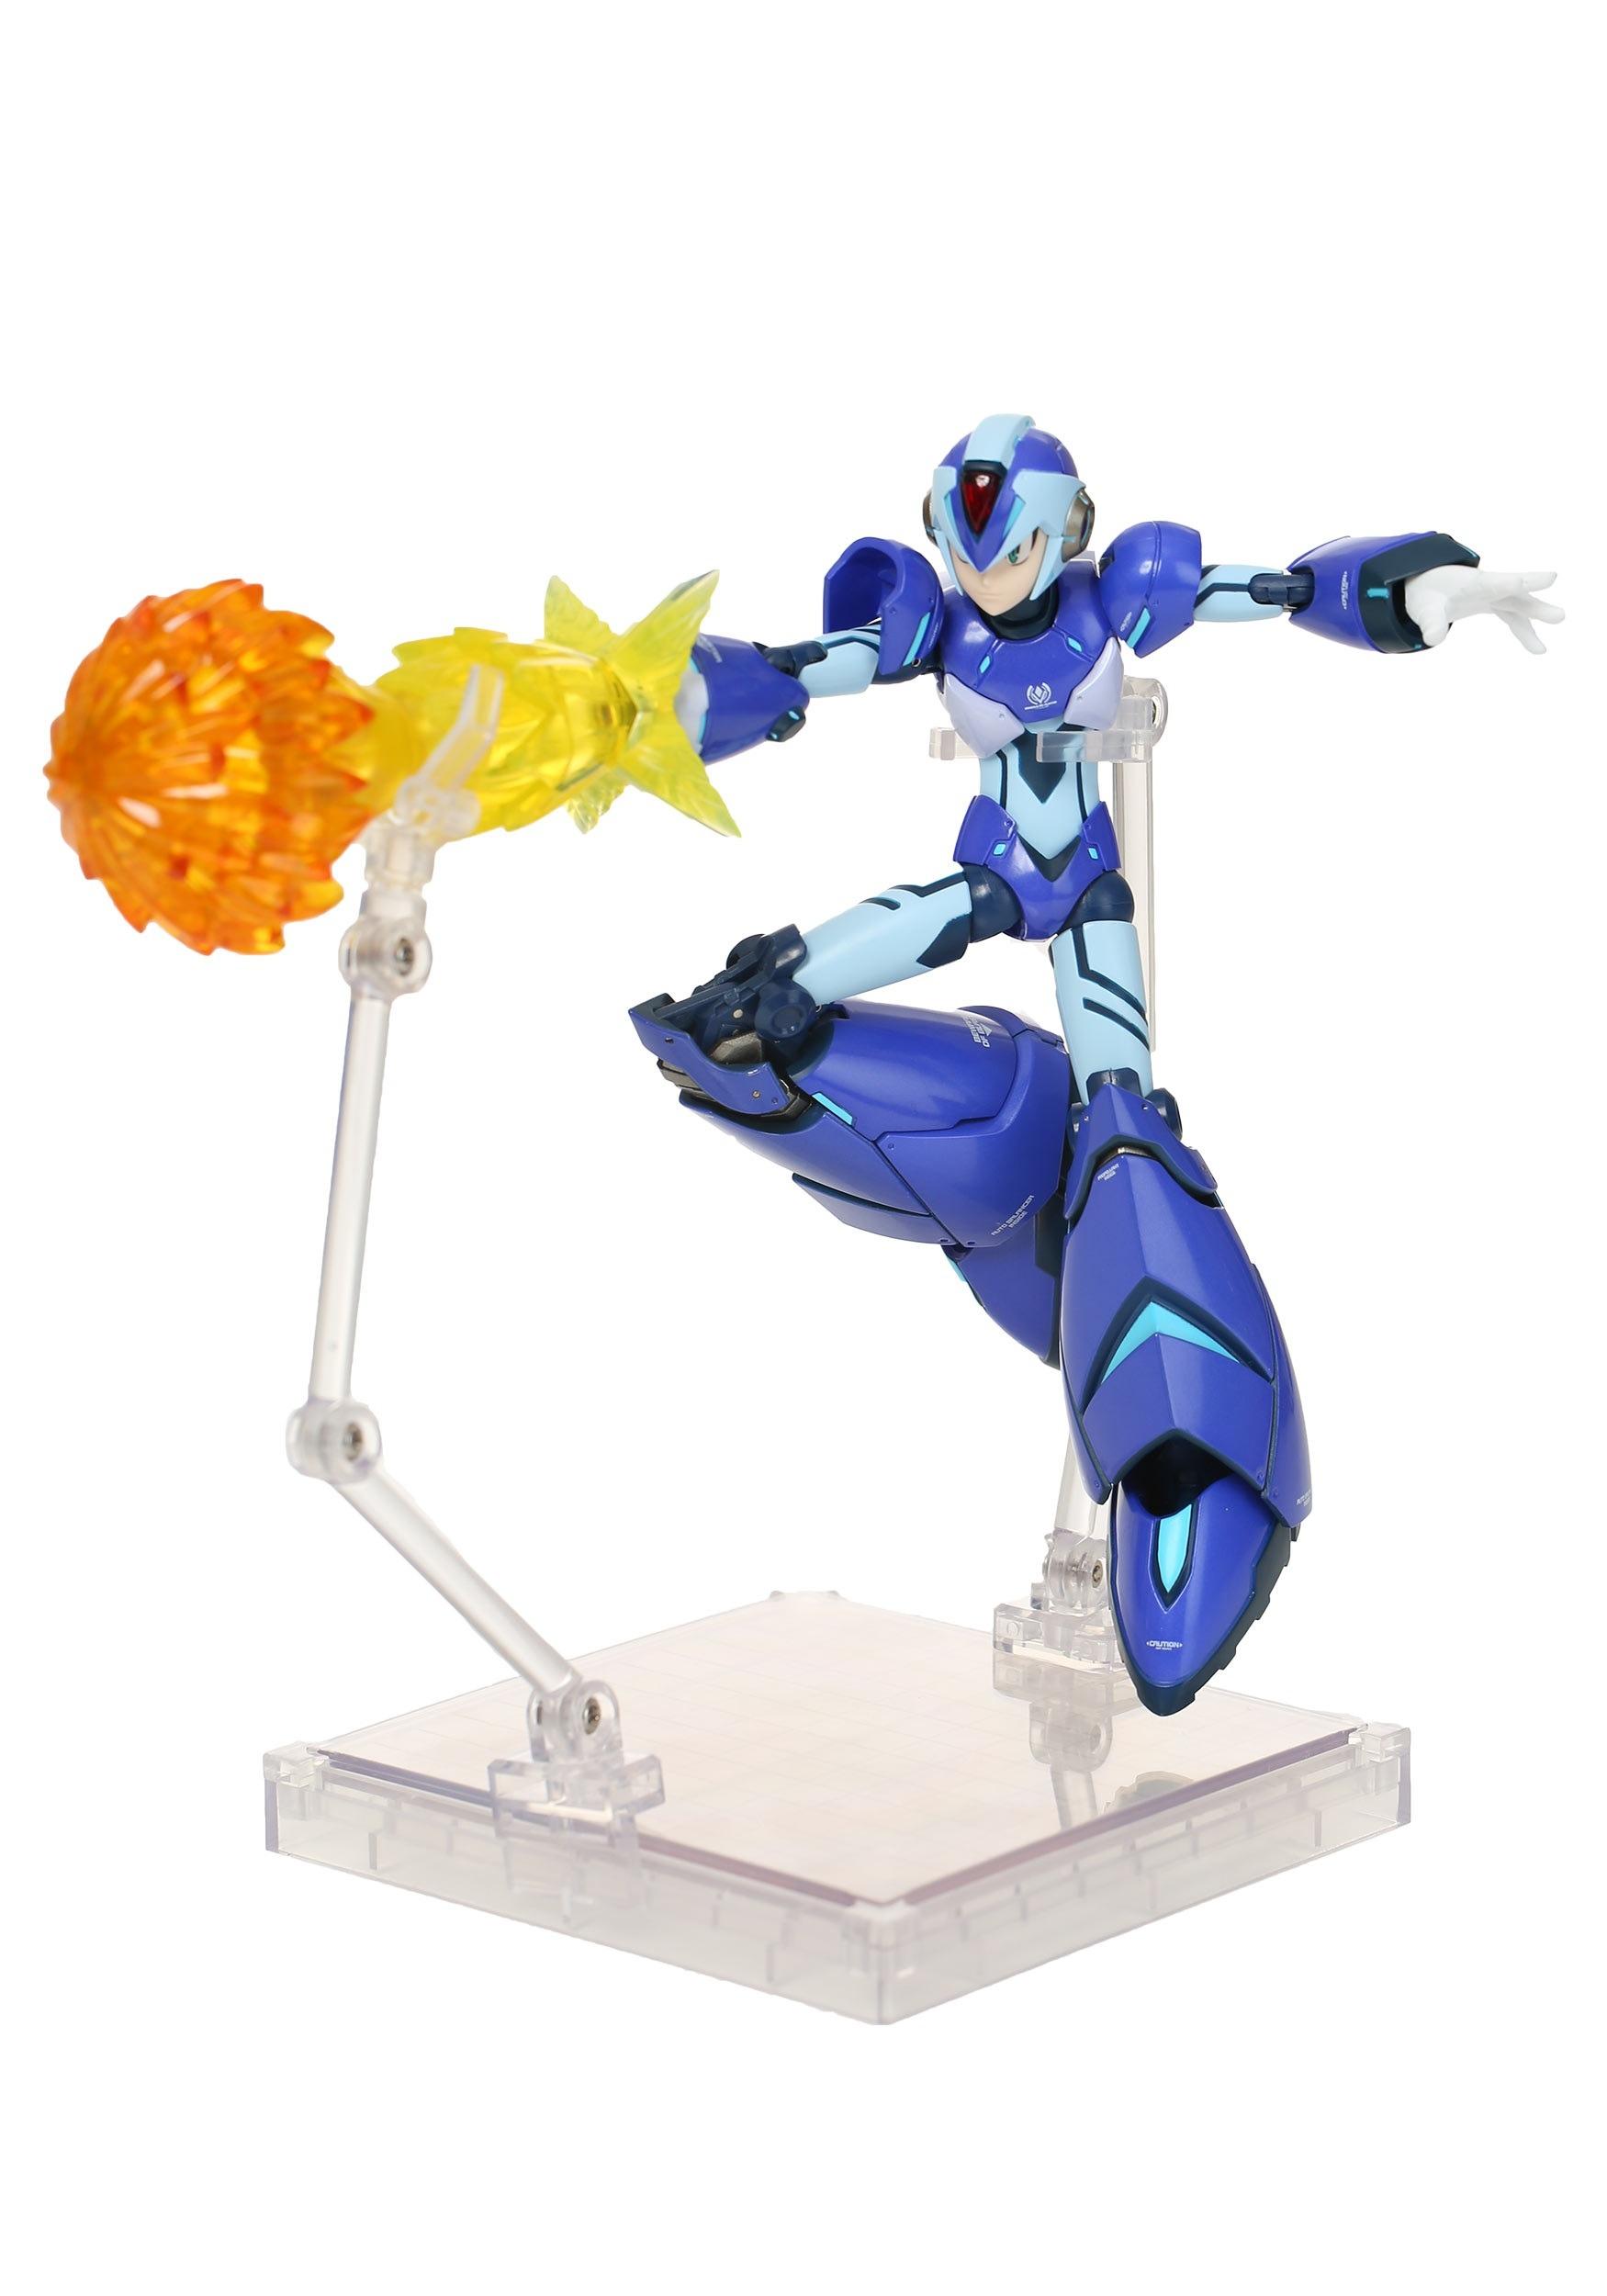 TruForce Collectibles Designer Series Mega Man Action Figure BFDTRU02001